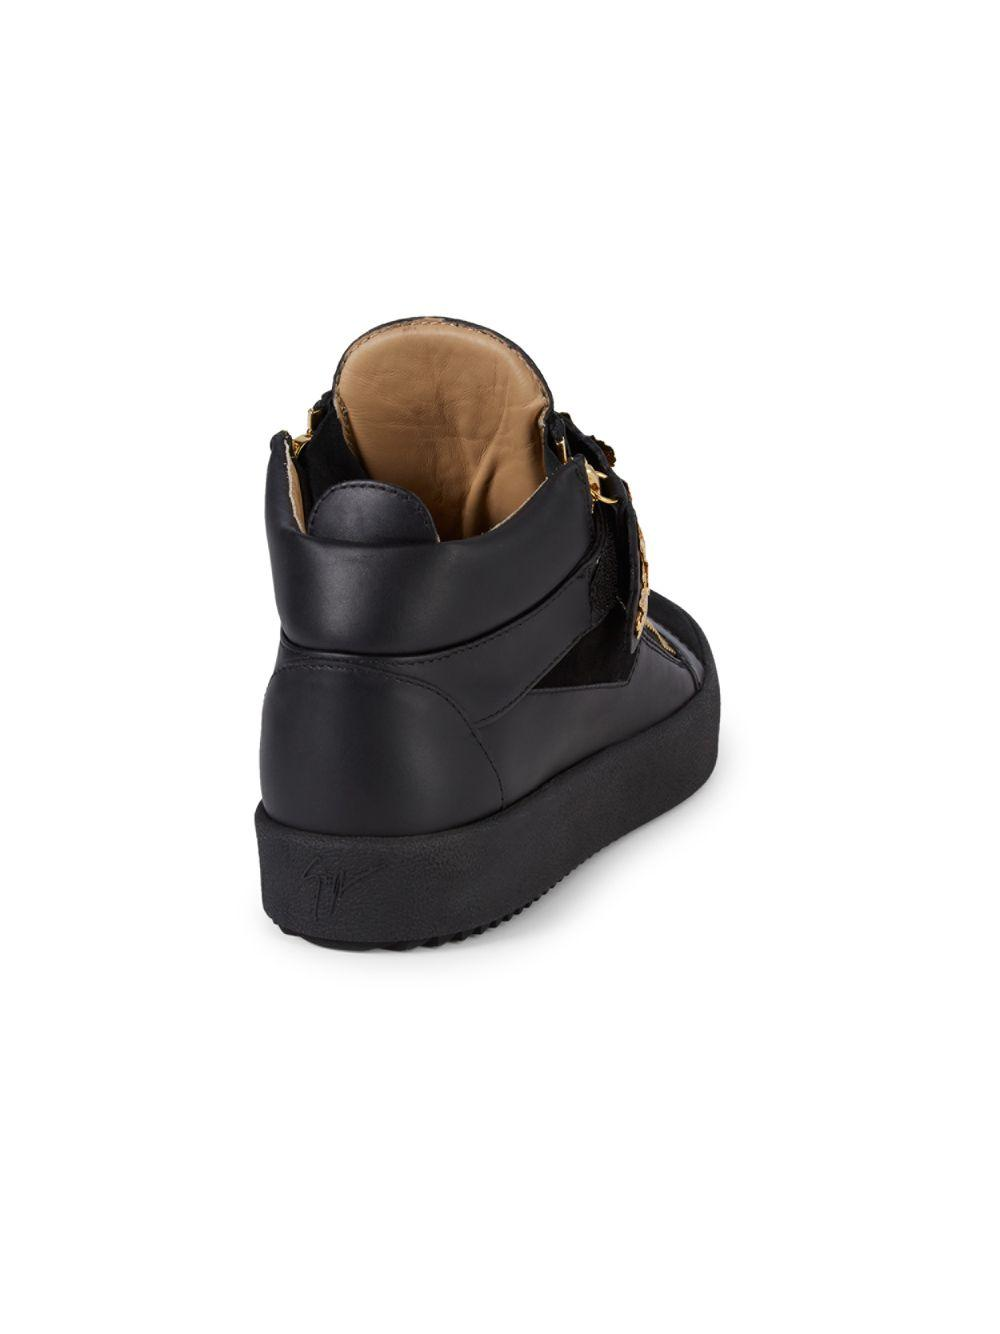 7ead4f39d Giuseppe Zanotti - Black Goldleaf High-top Sneakers - Lyst. View fullscreen